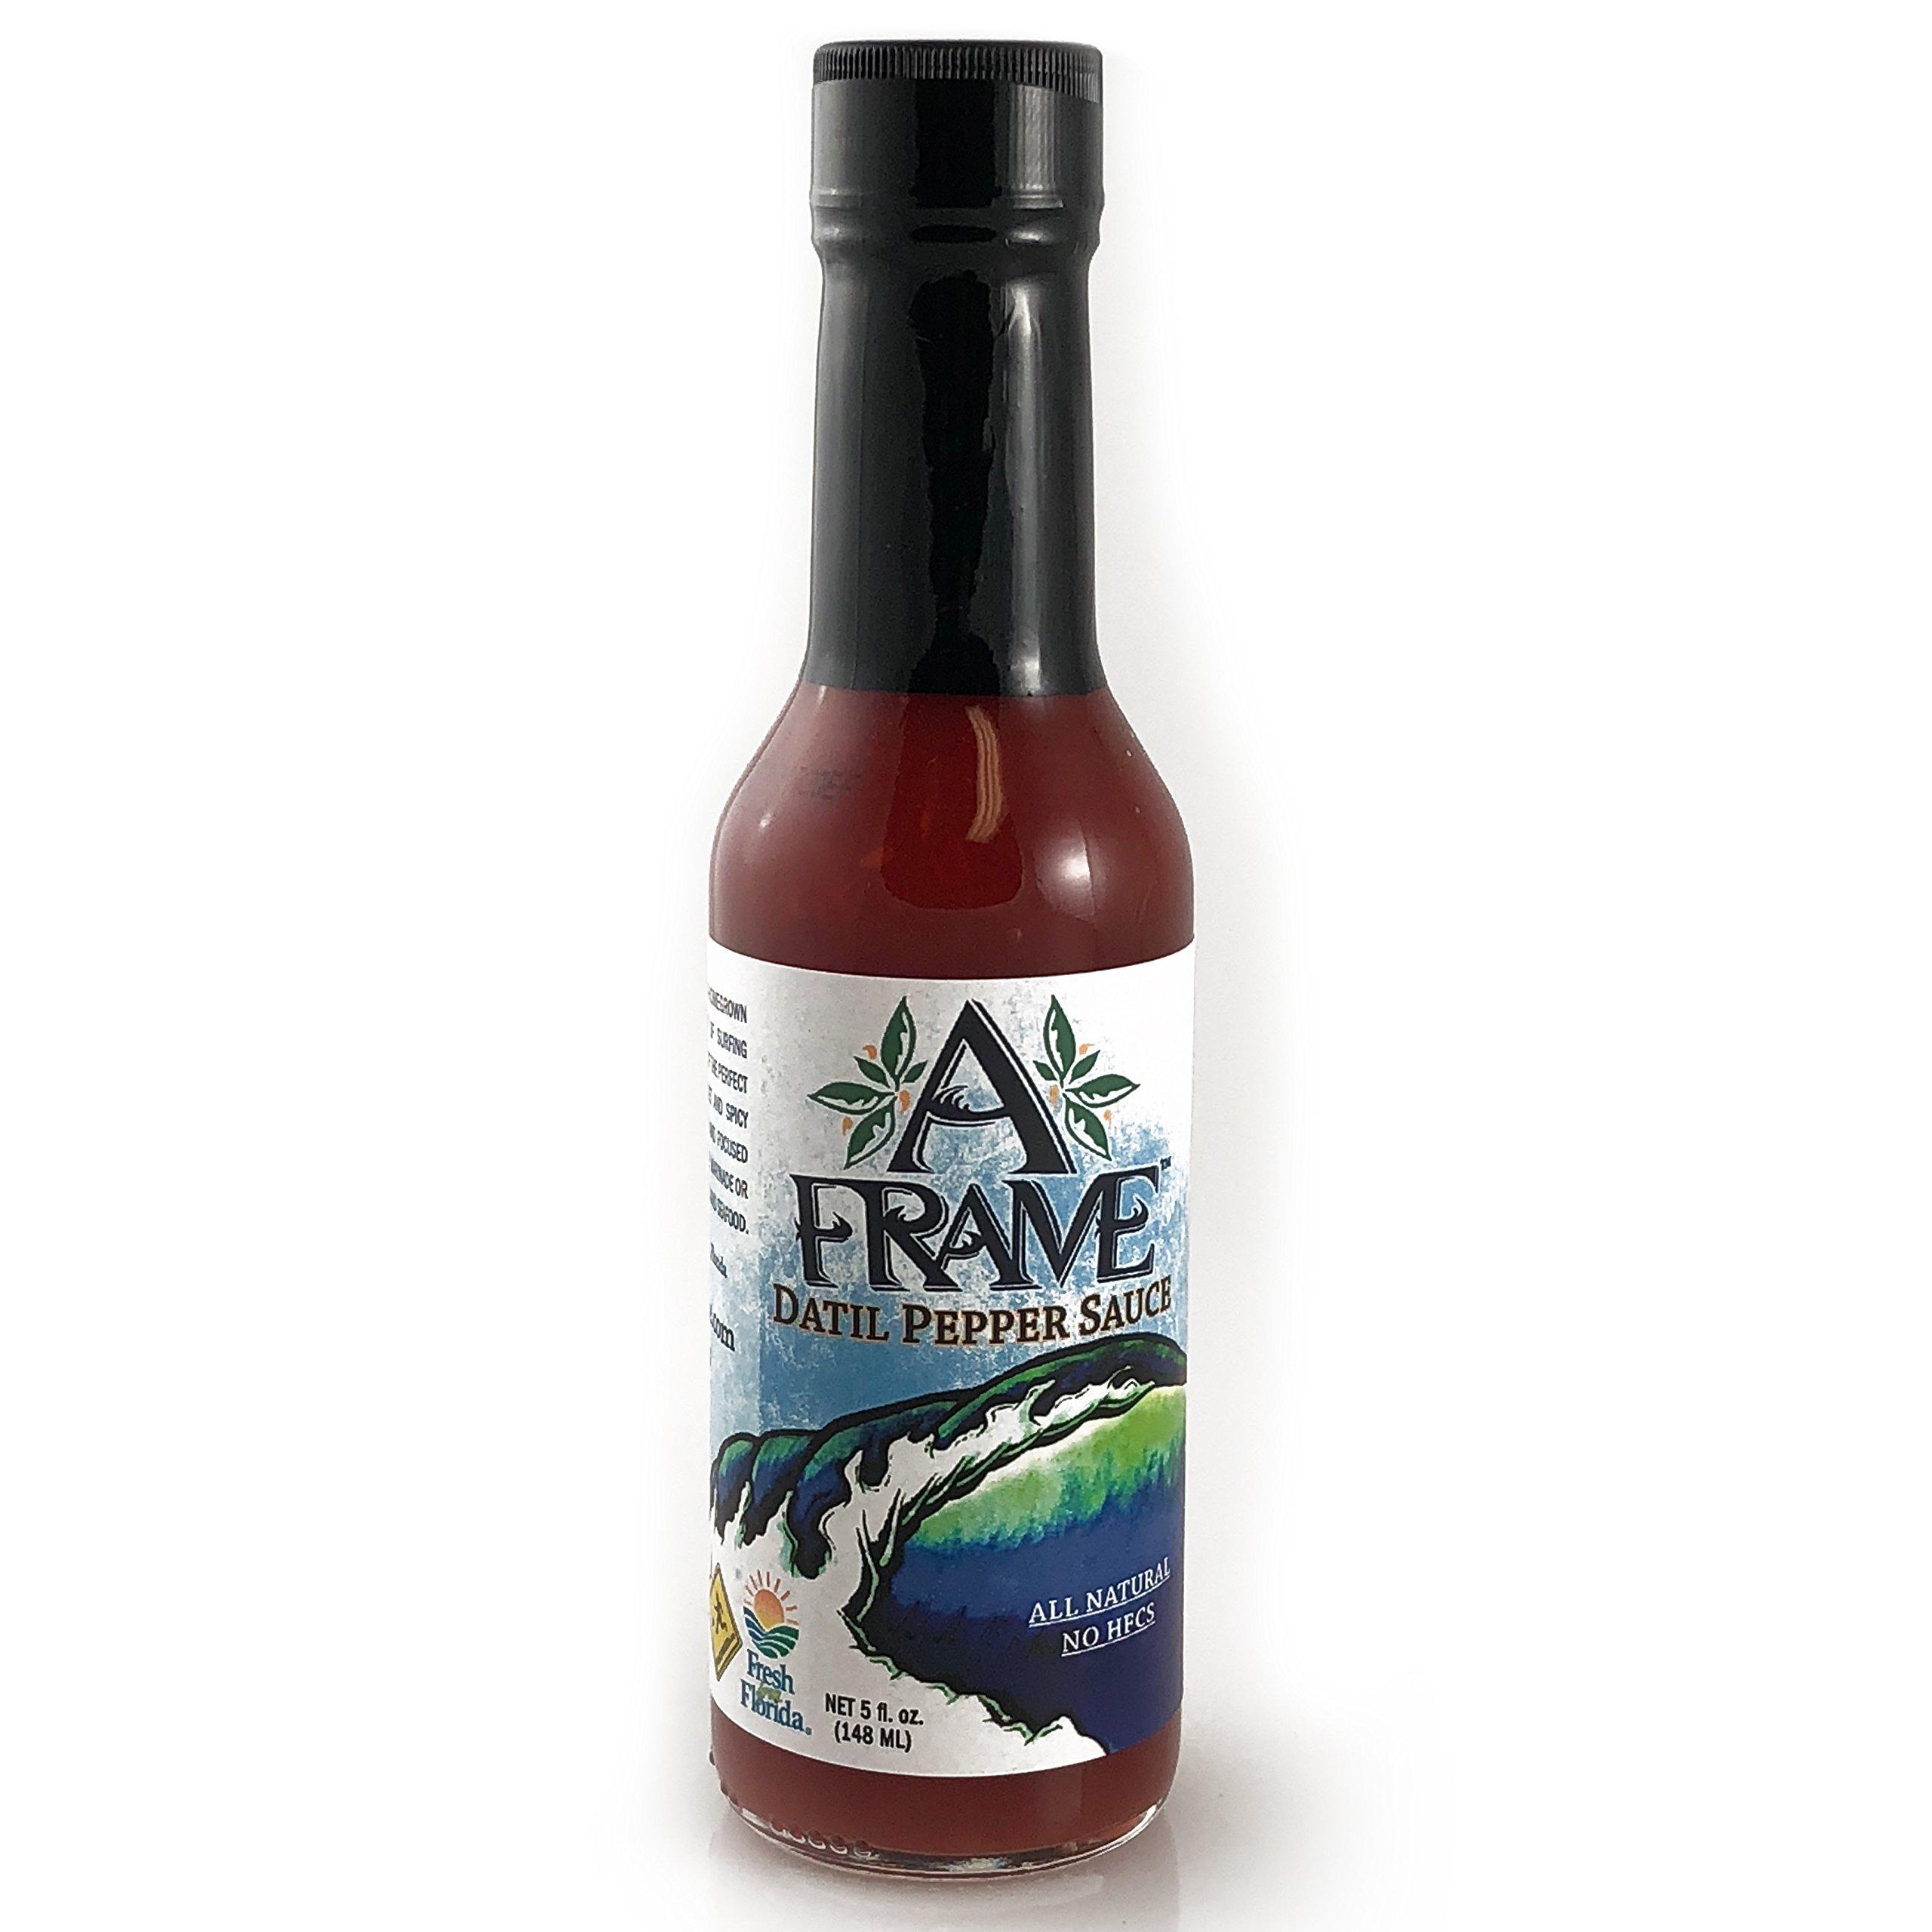 Amazon.com : San Augustin Datil Pepper Table Sauce, 8 ounce bottle ...